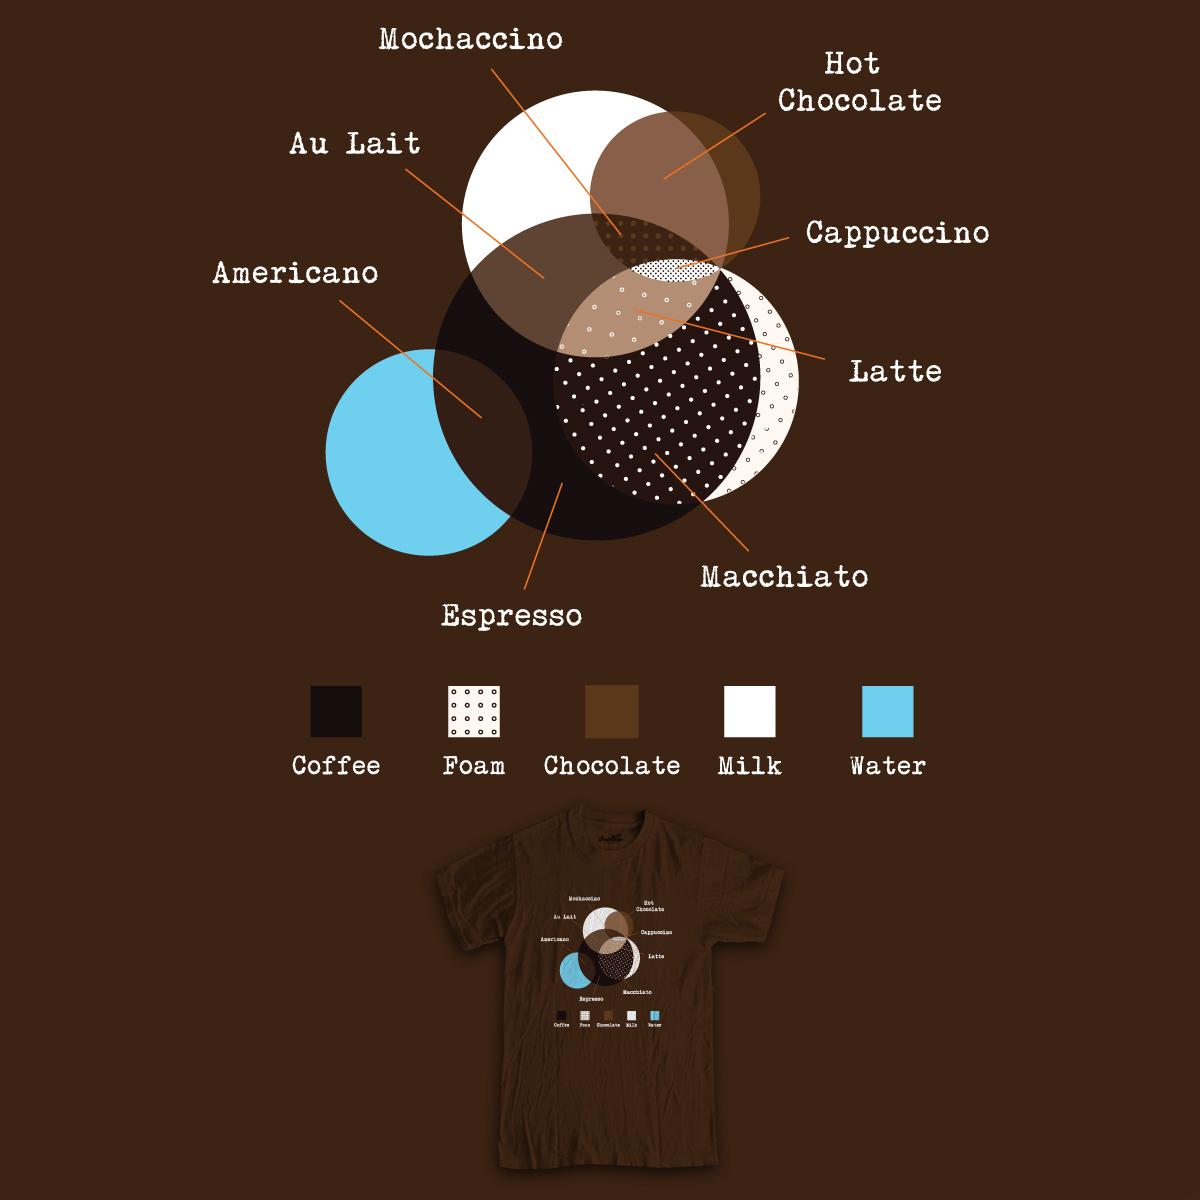 Coffeeuler Diagram by staffell on Threadless